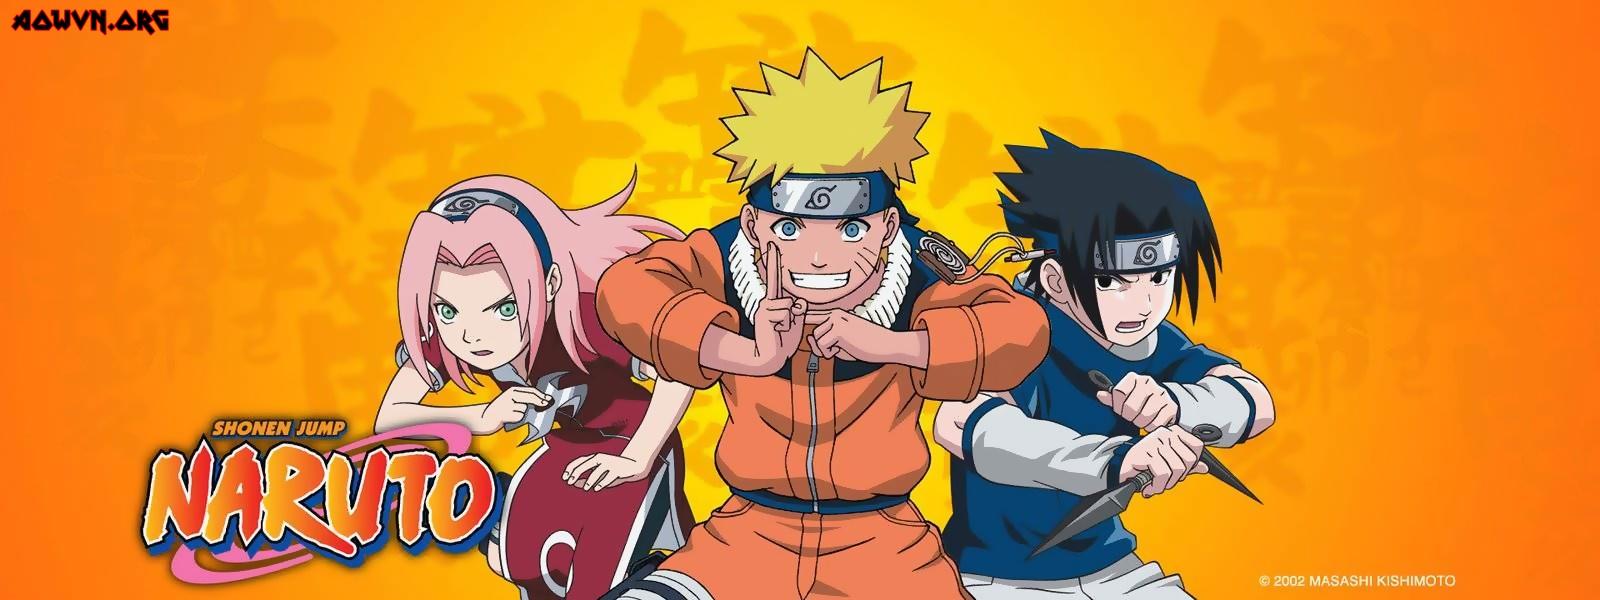 GuK8soz - [ Anime 3gp Mp4 | Ep 130 ] Naruto Dattebayo | Vietsub - Bầu trời tuổi thơ!!